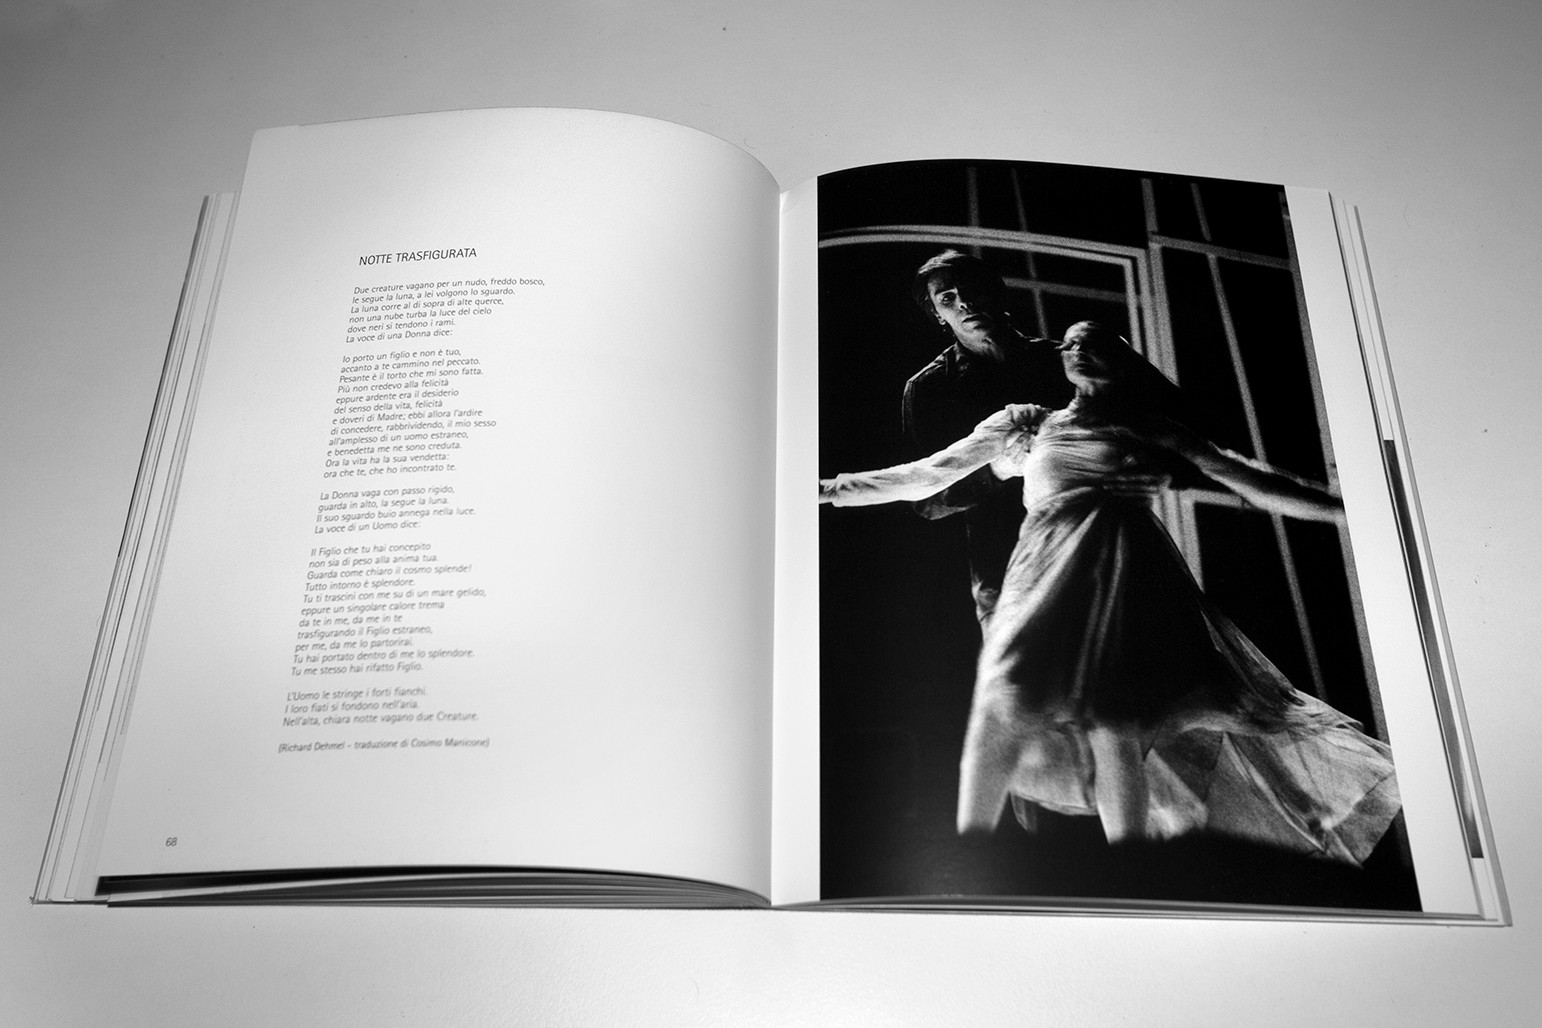 'Notte Trasfigurata', music by Arnold Schönberg, Teatro Toselli, Cuneo, Italy 1999